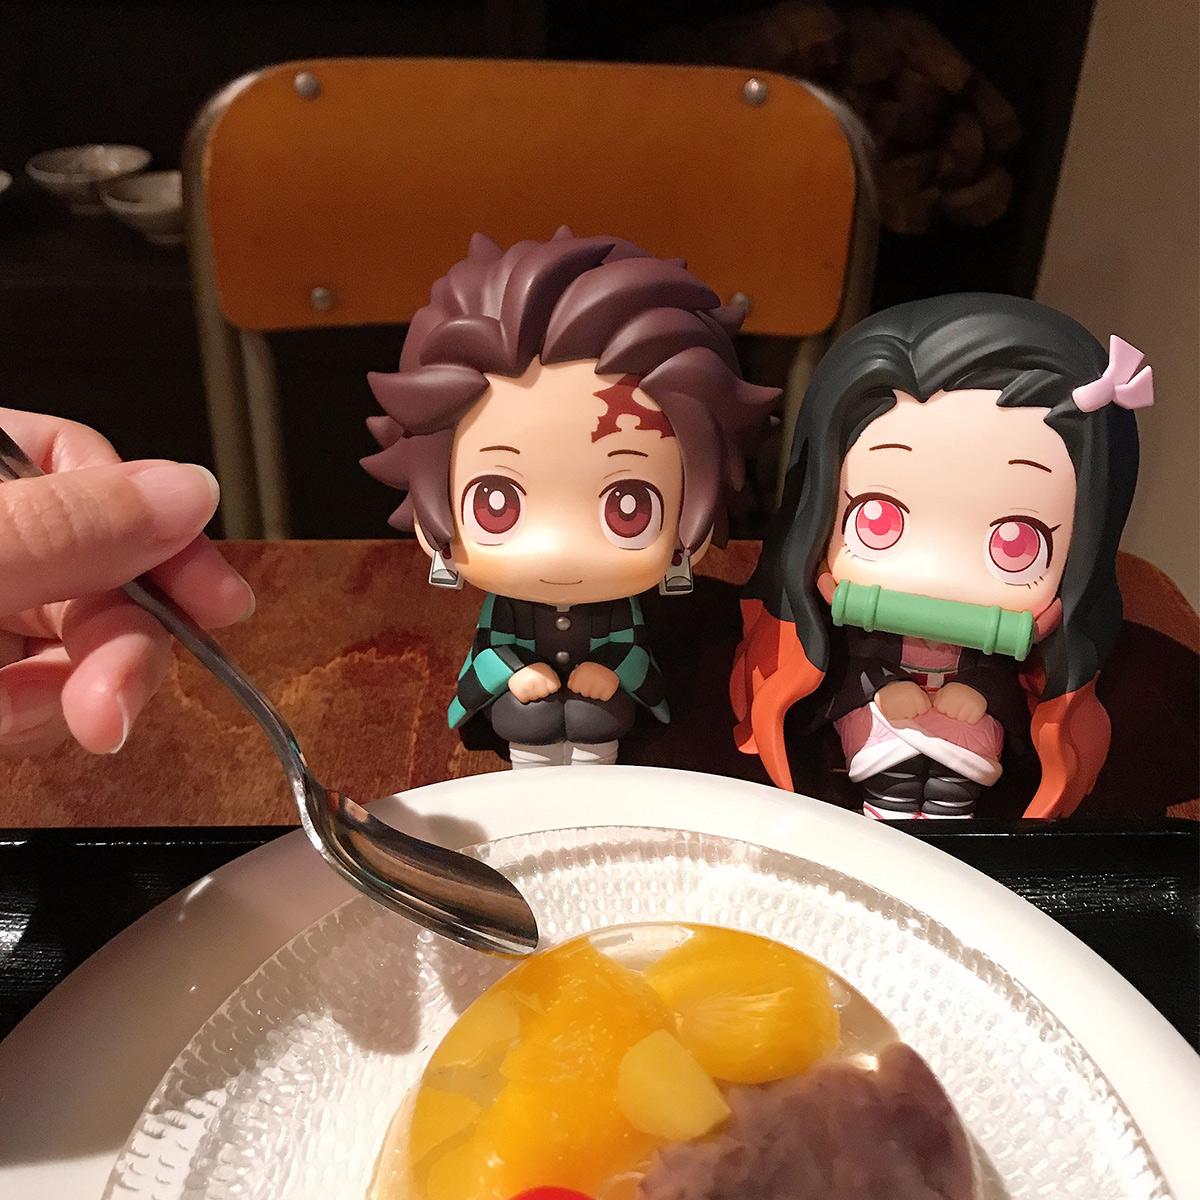 Tanjiro & Nezuko Look Up Series Demon Slayer Figure Set with Gift